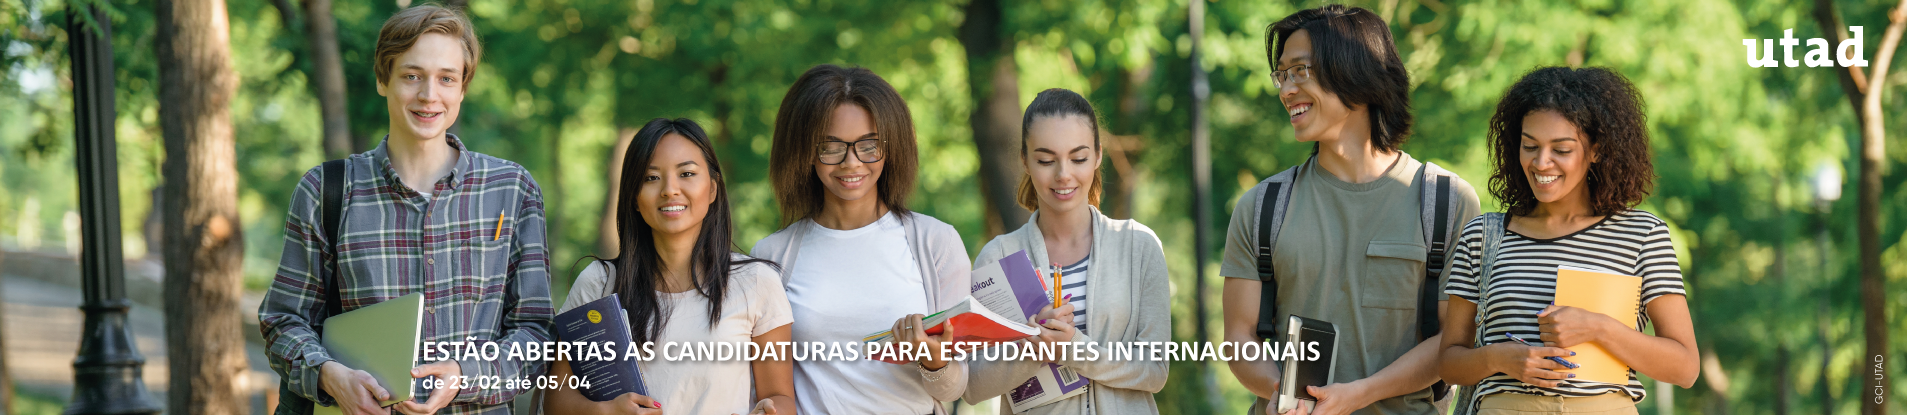 sliders estudantes internacionais